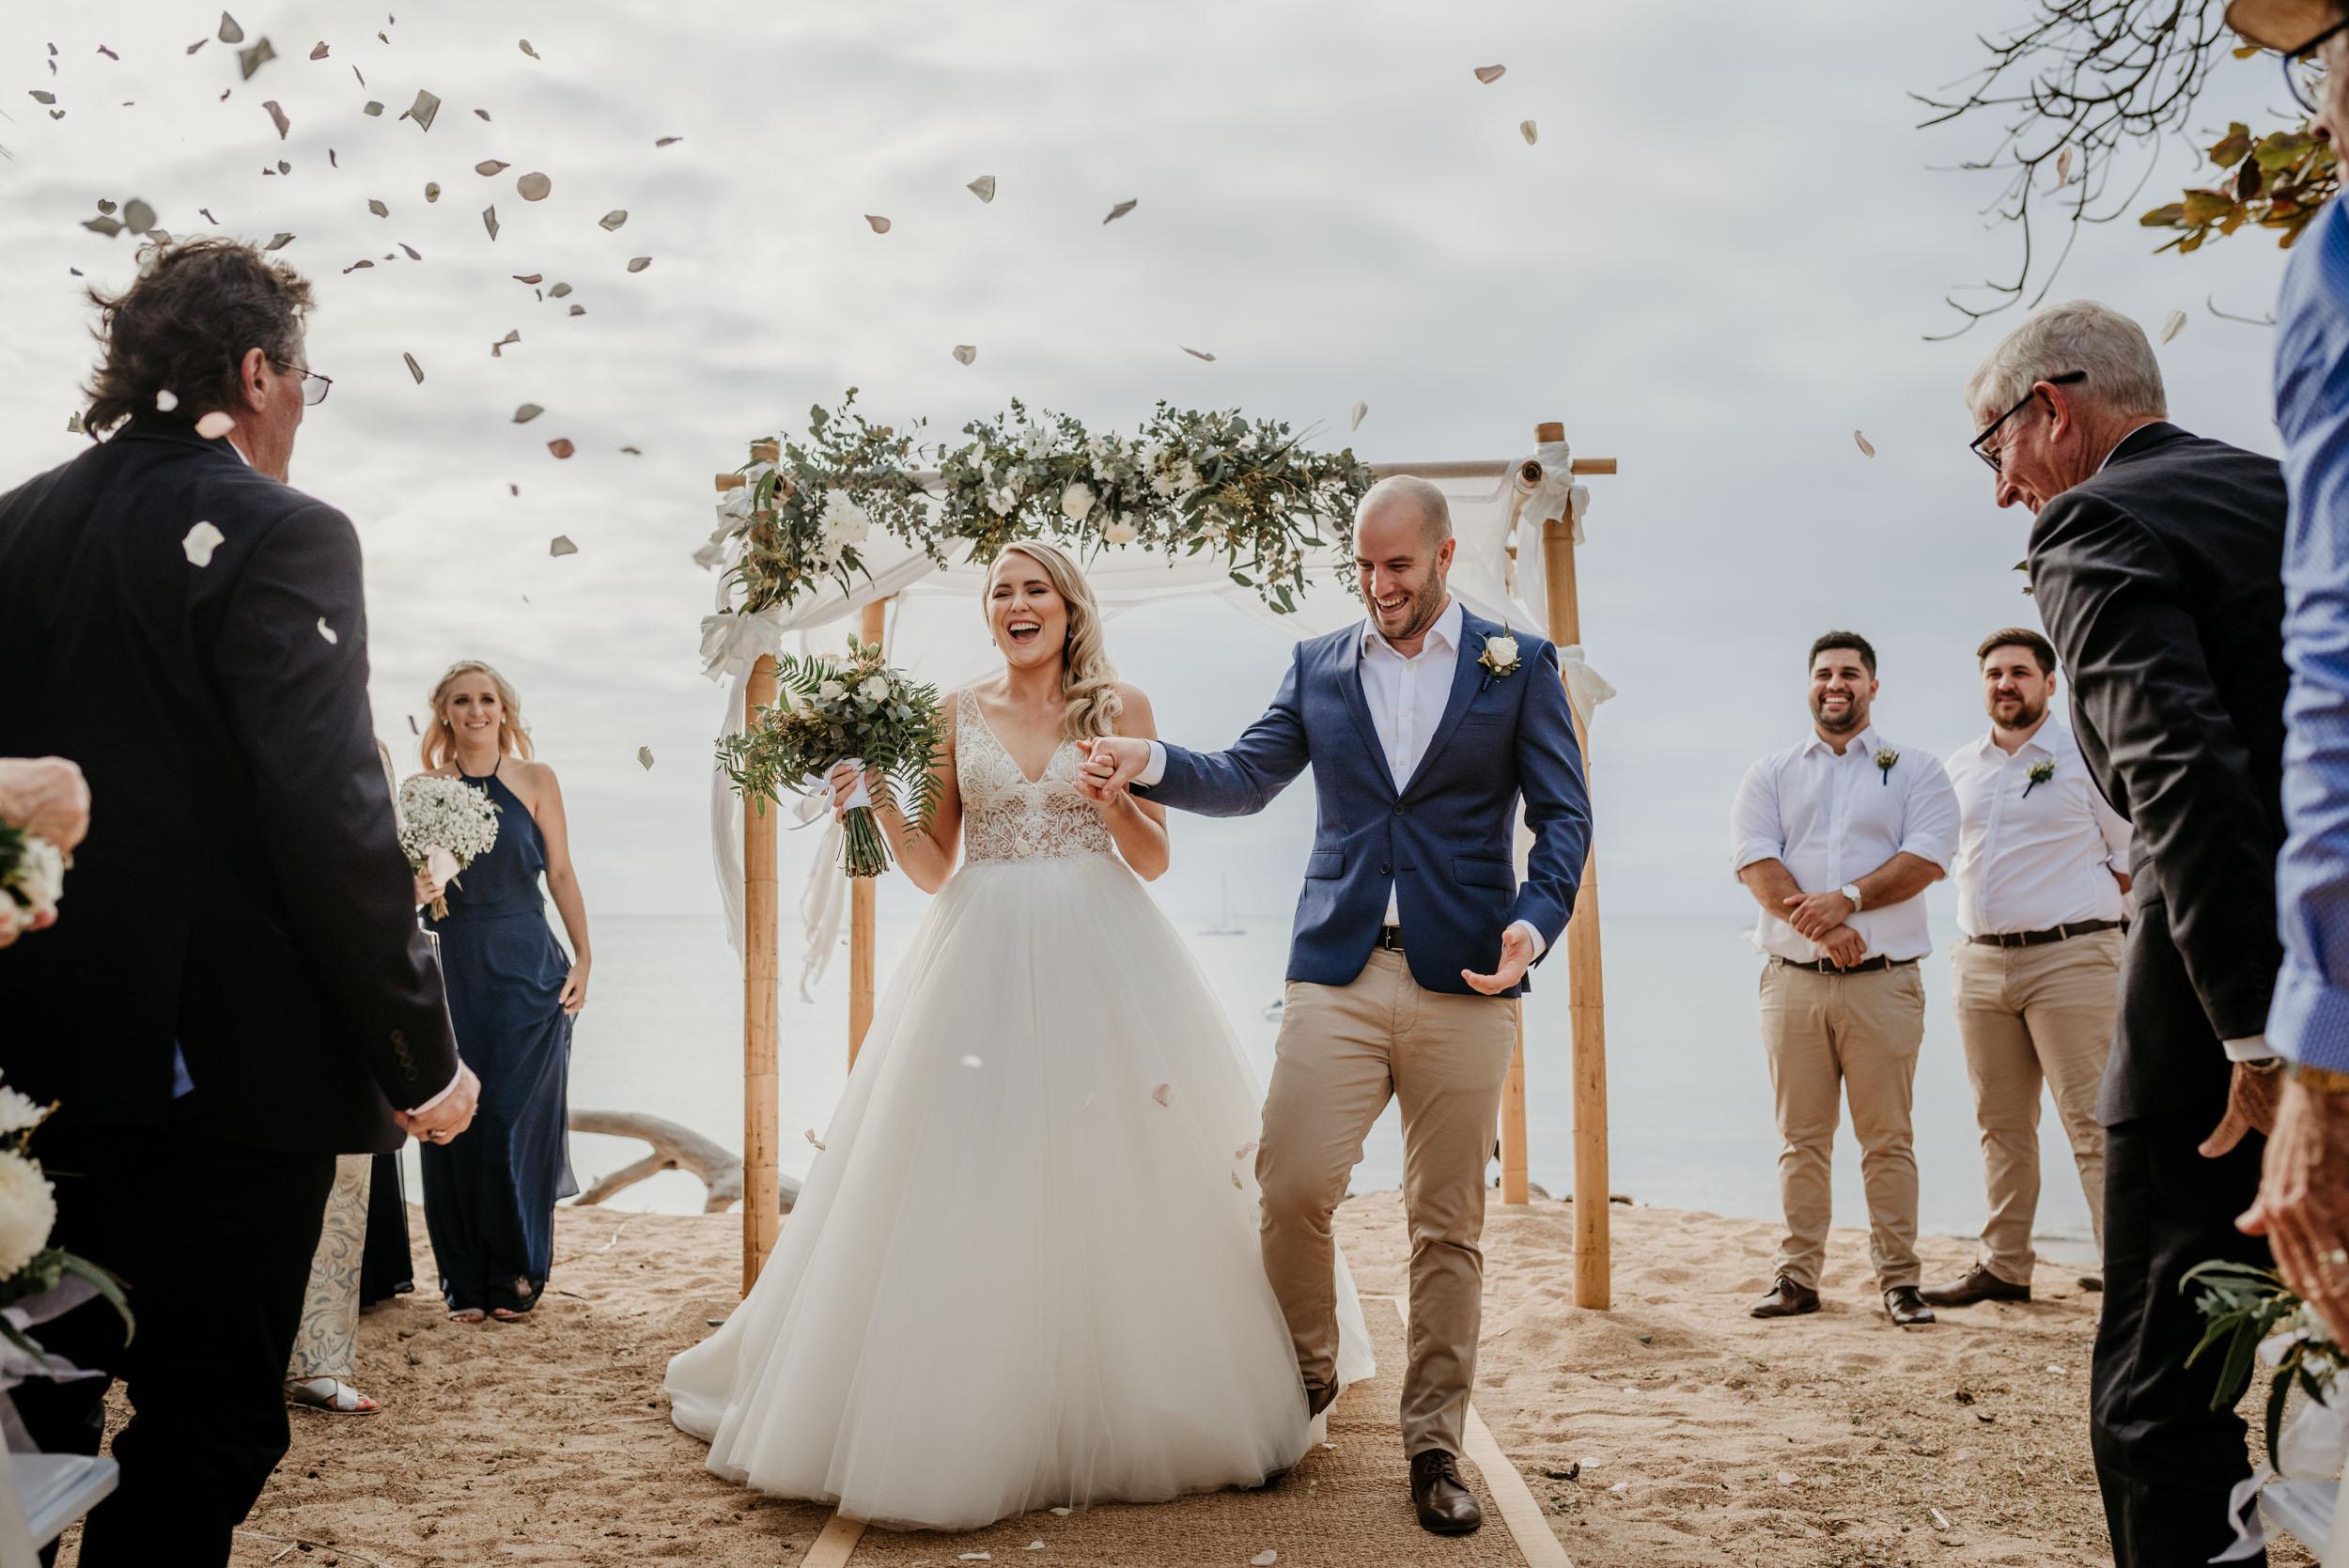 The Raw Photographer - Cairns and Port Douglas Wedding Photographer - Best of 2018-23.jpg